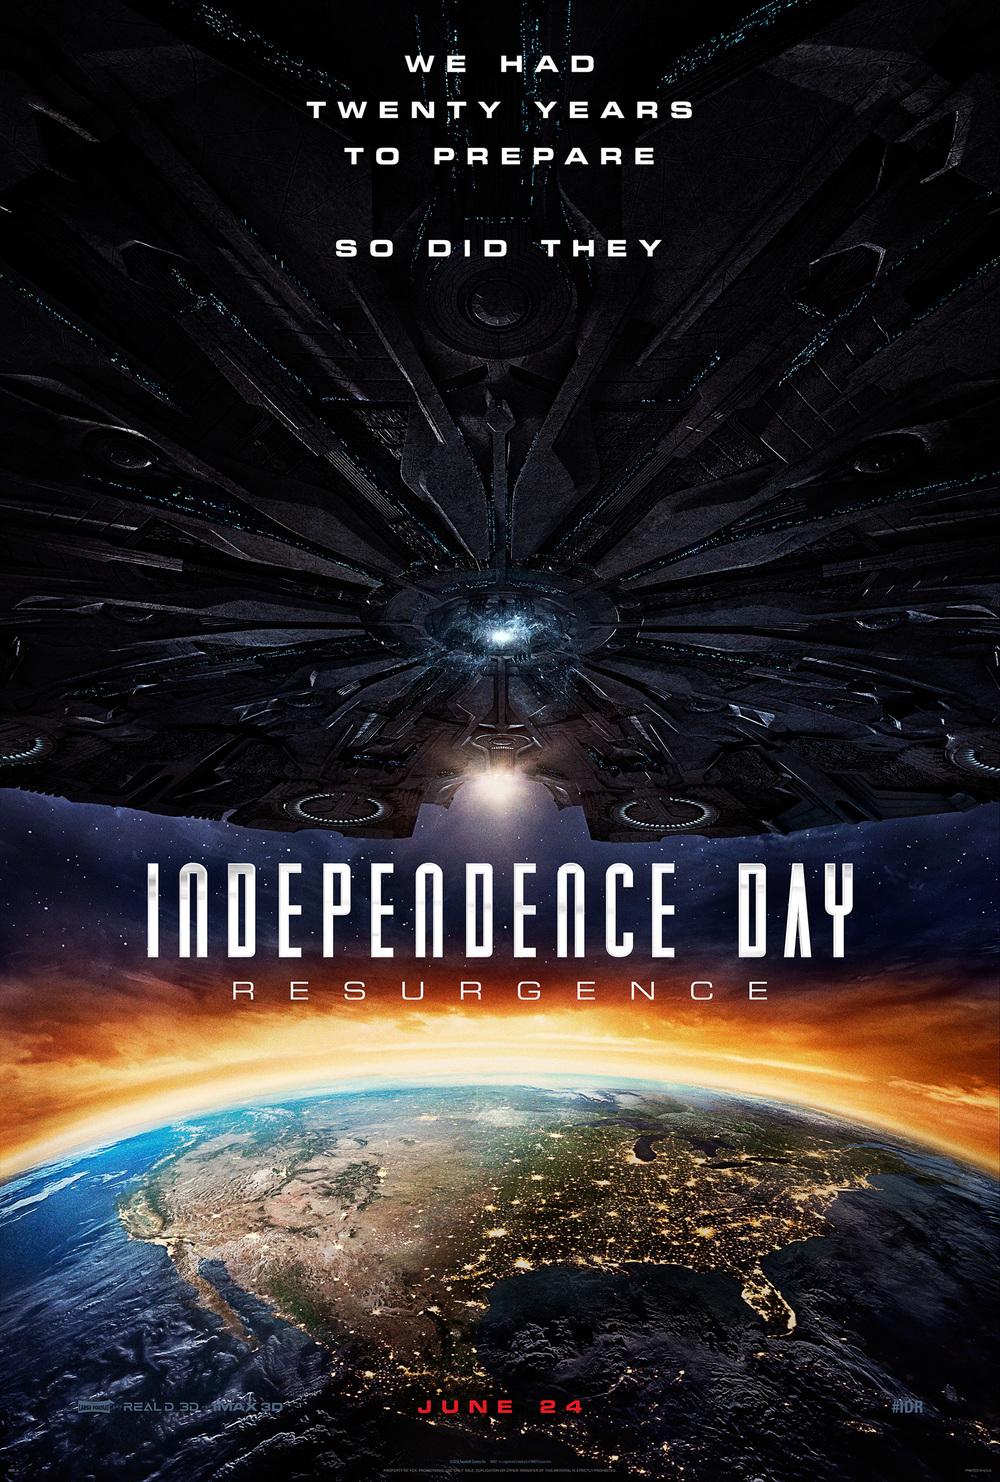 http://www.3dor2d.com/reviews/independence-day-resurgence